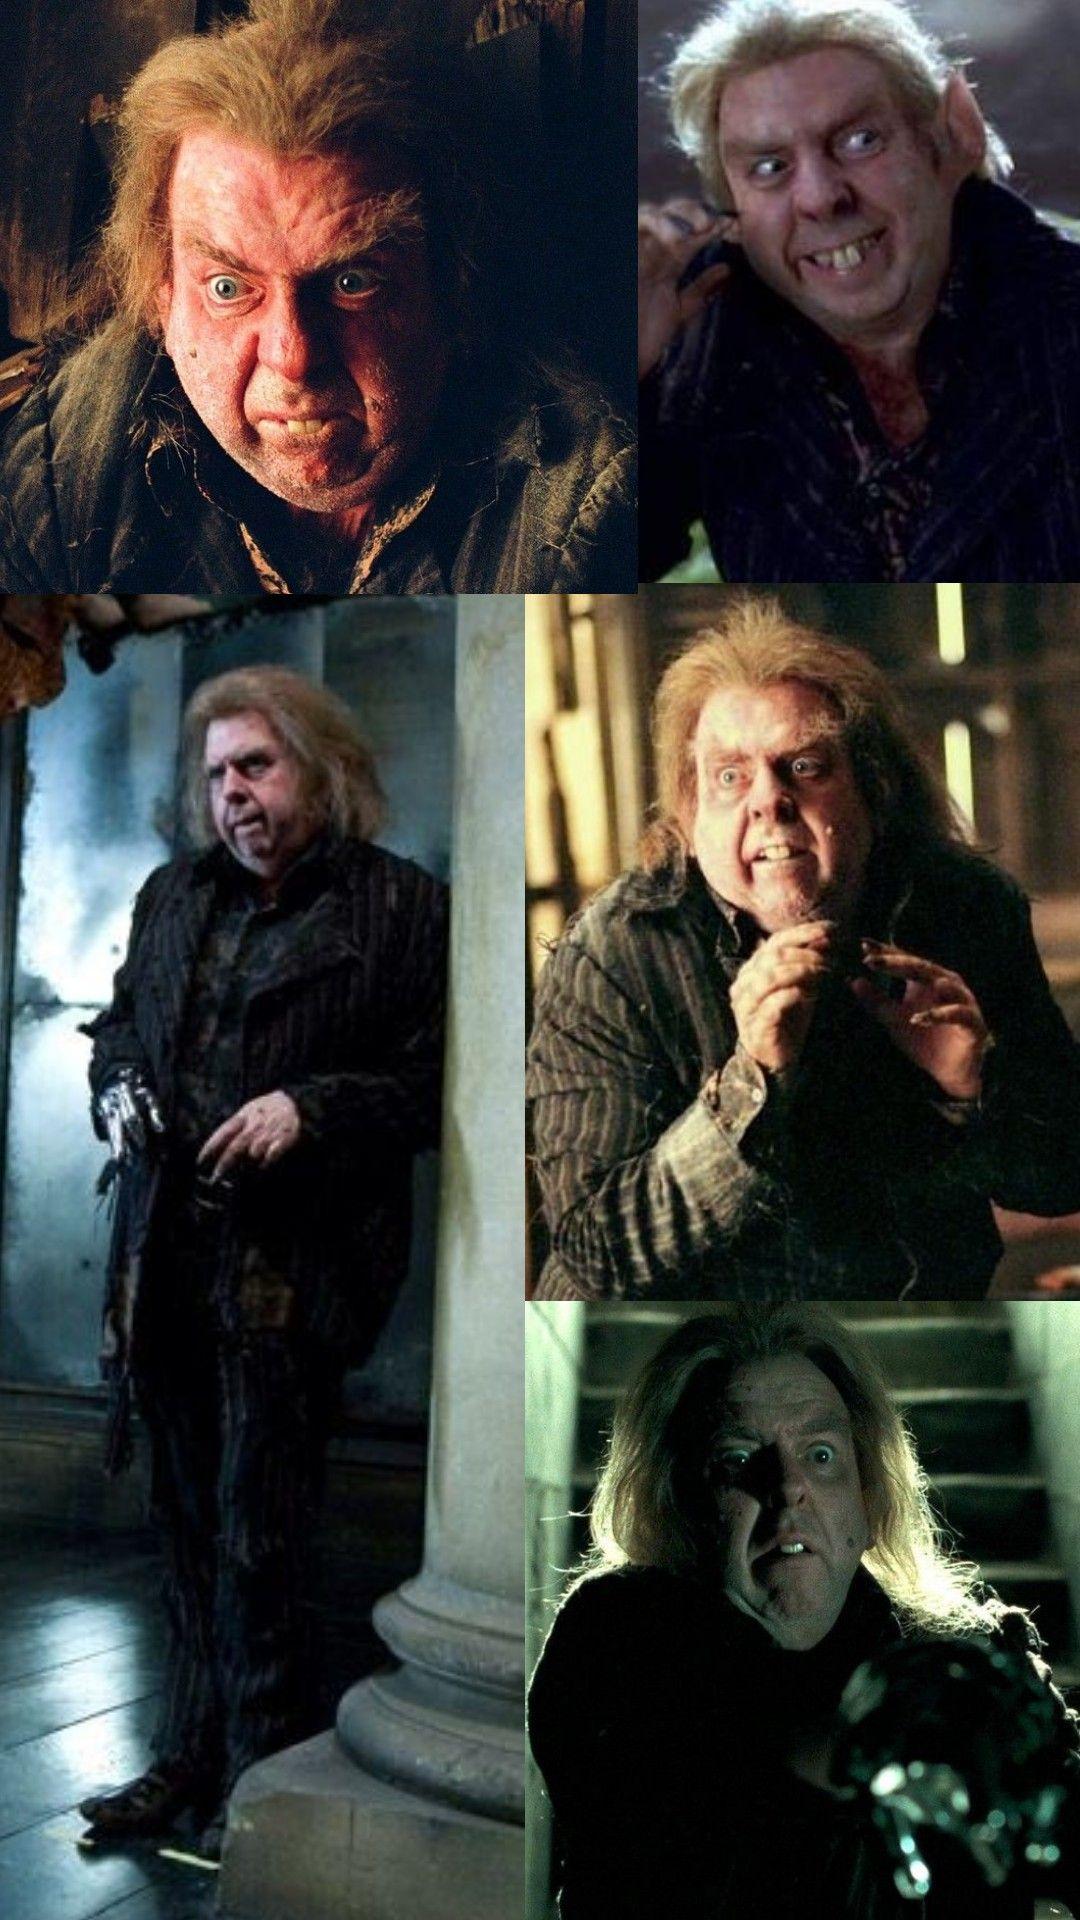 Peter Pettigrew Wallpaper In 2021 Harry Potter Villains Harry Potter Characters Peter Pettigrew